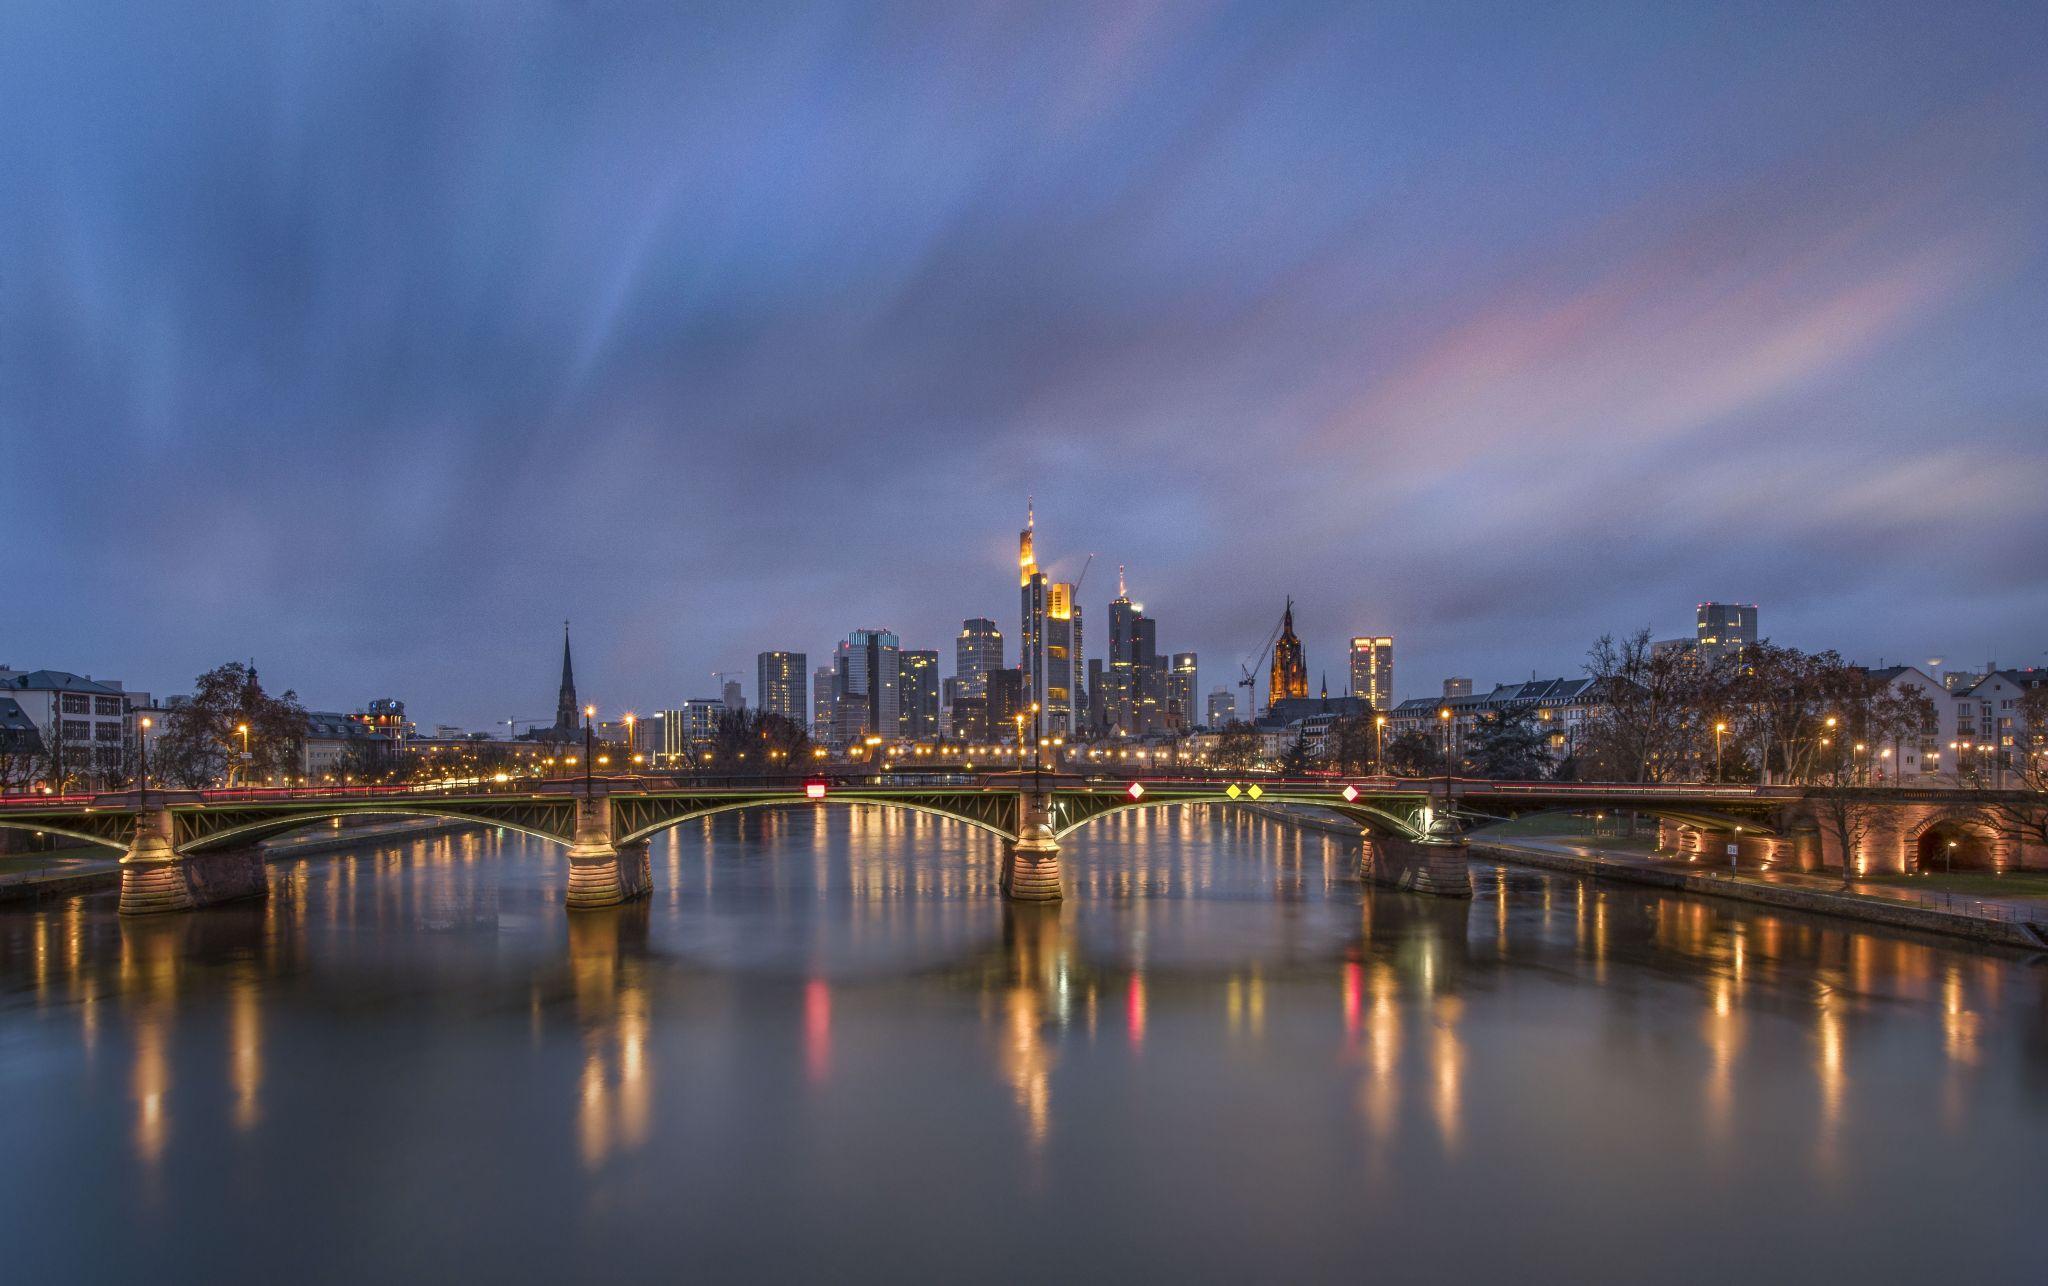 Frankfurt Classic, Germany